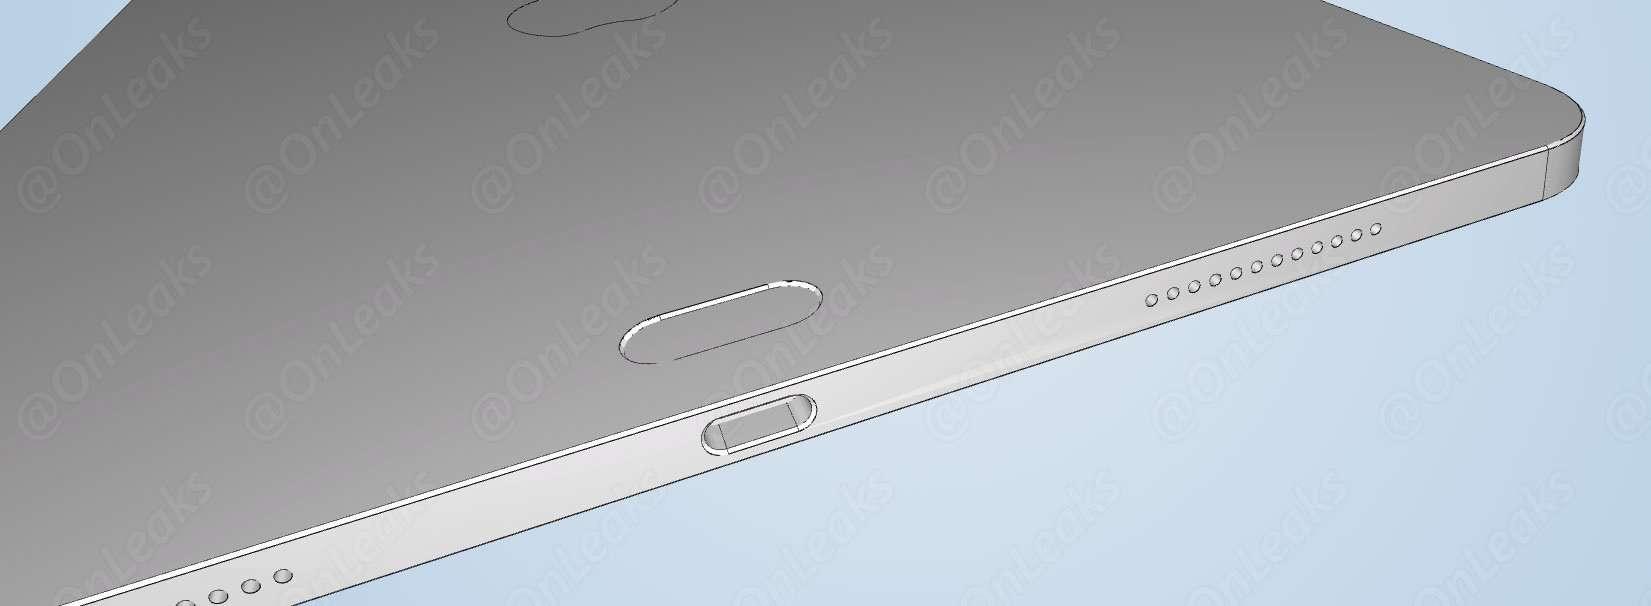 iPad Pro afbeelding smart connector